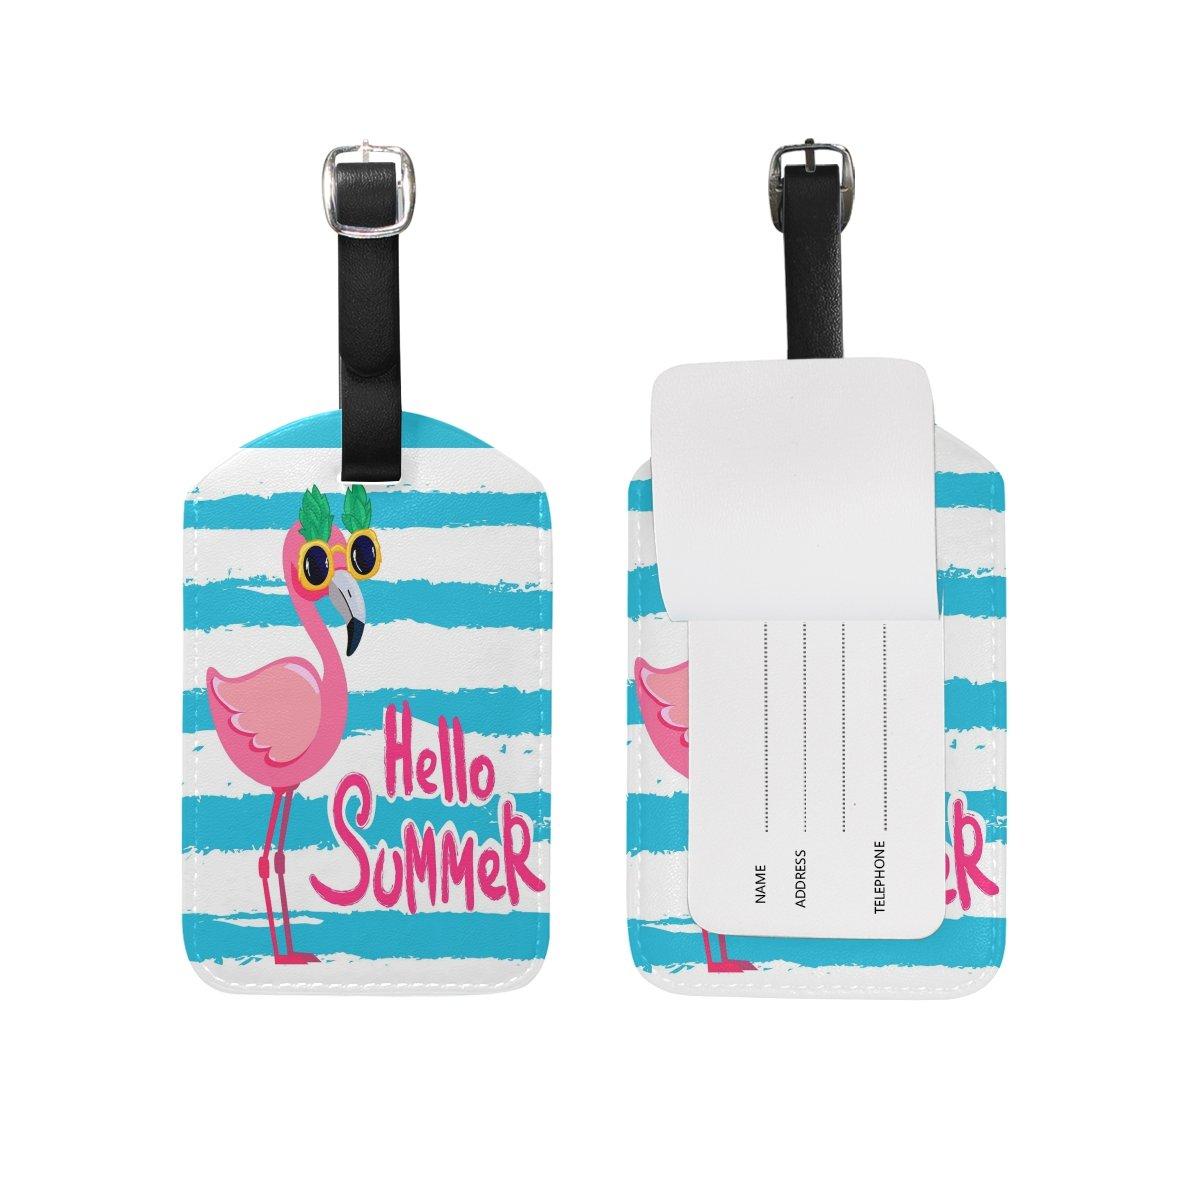 ALAZA Cute Funny Flamingo Luggage Tags PU Leather Suitcase Baggage Labels 2PCS